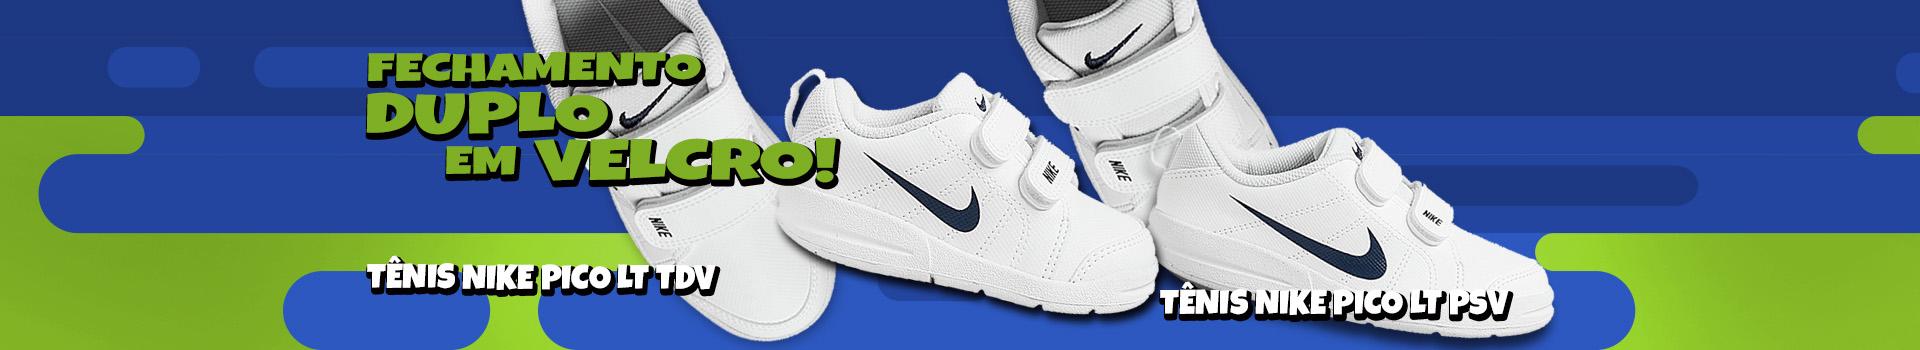 TV5-Nike_Pico_LT